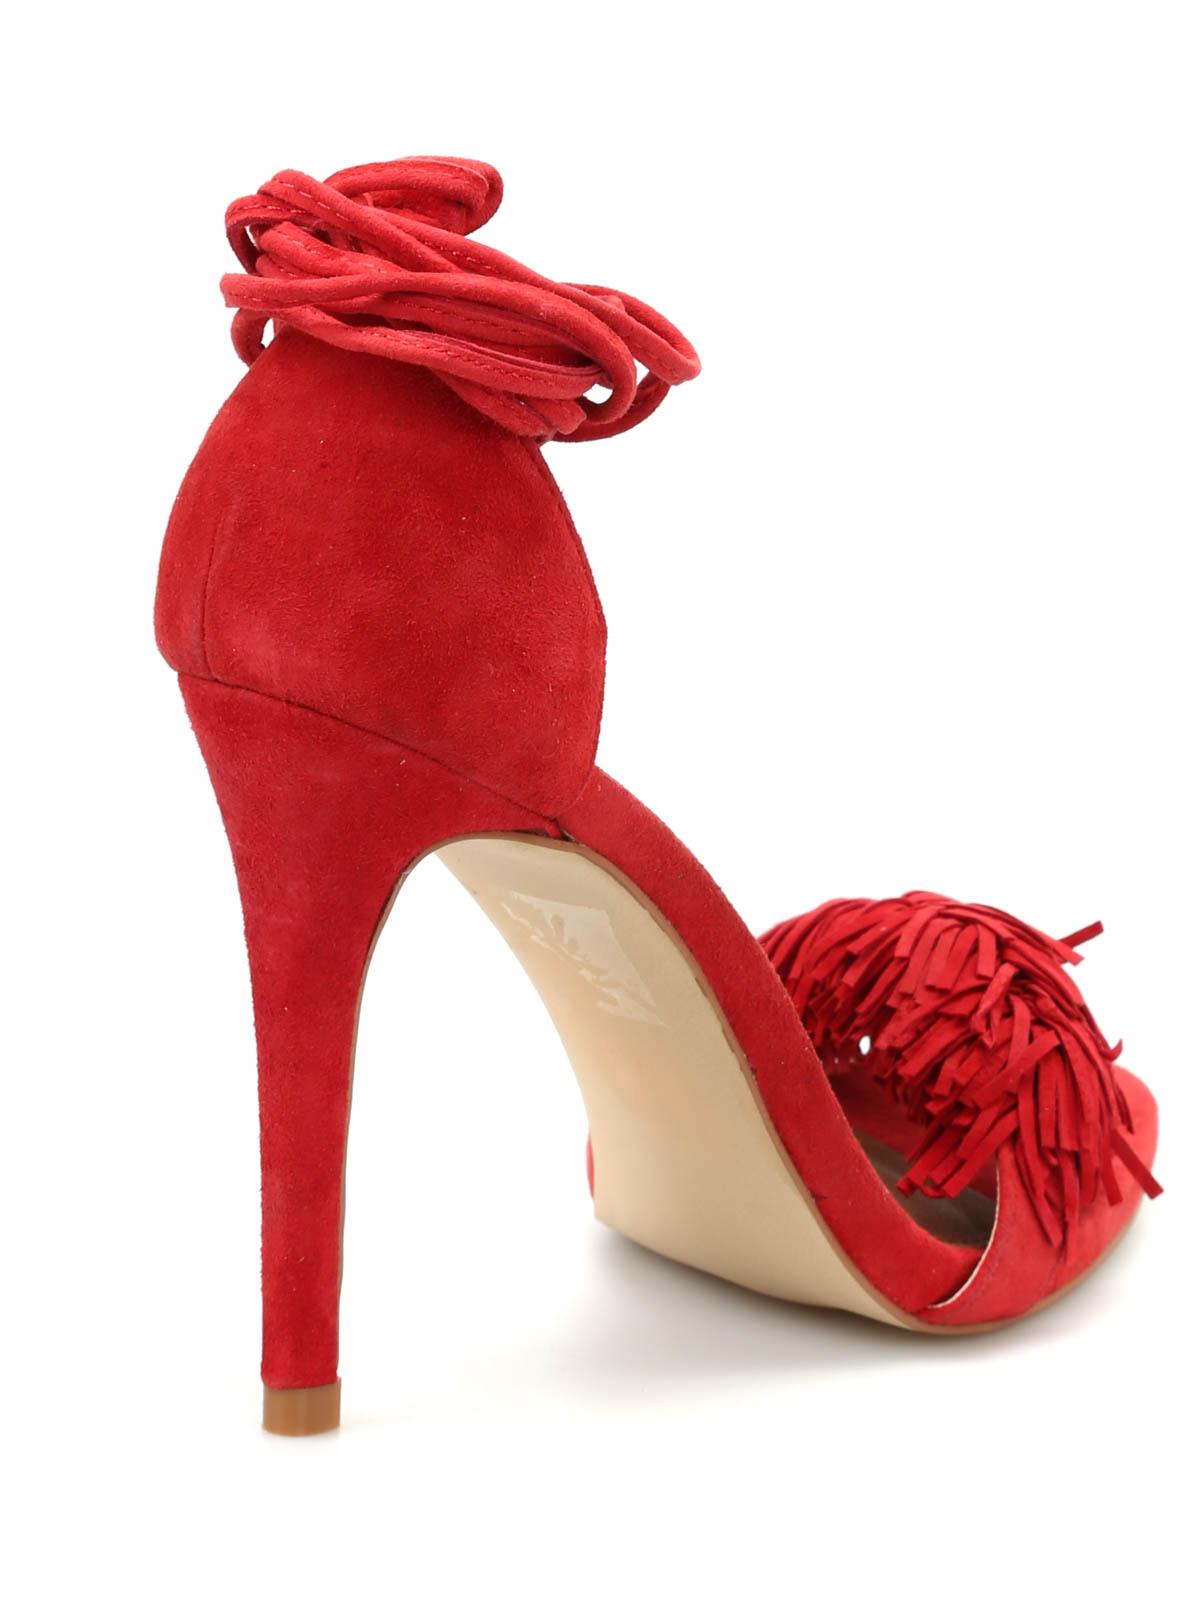 6666cccc20d Steve Madden - Sassey sandals - sandals - SASSEY RED